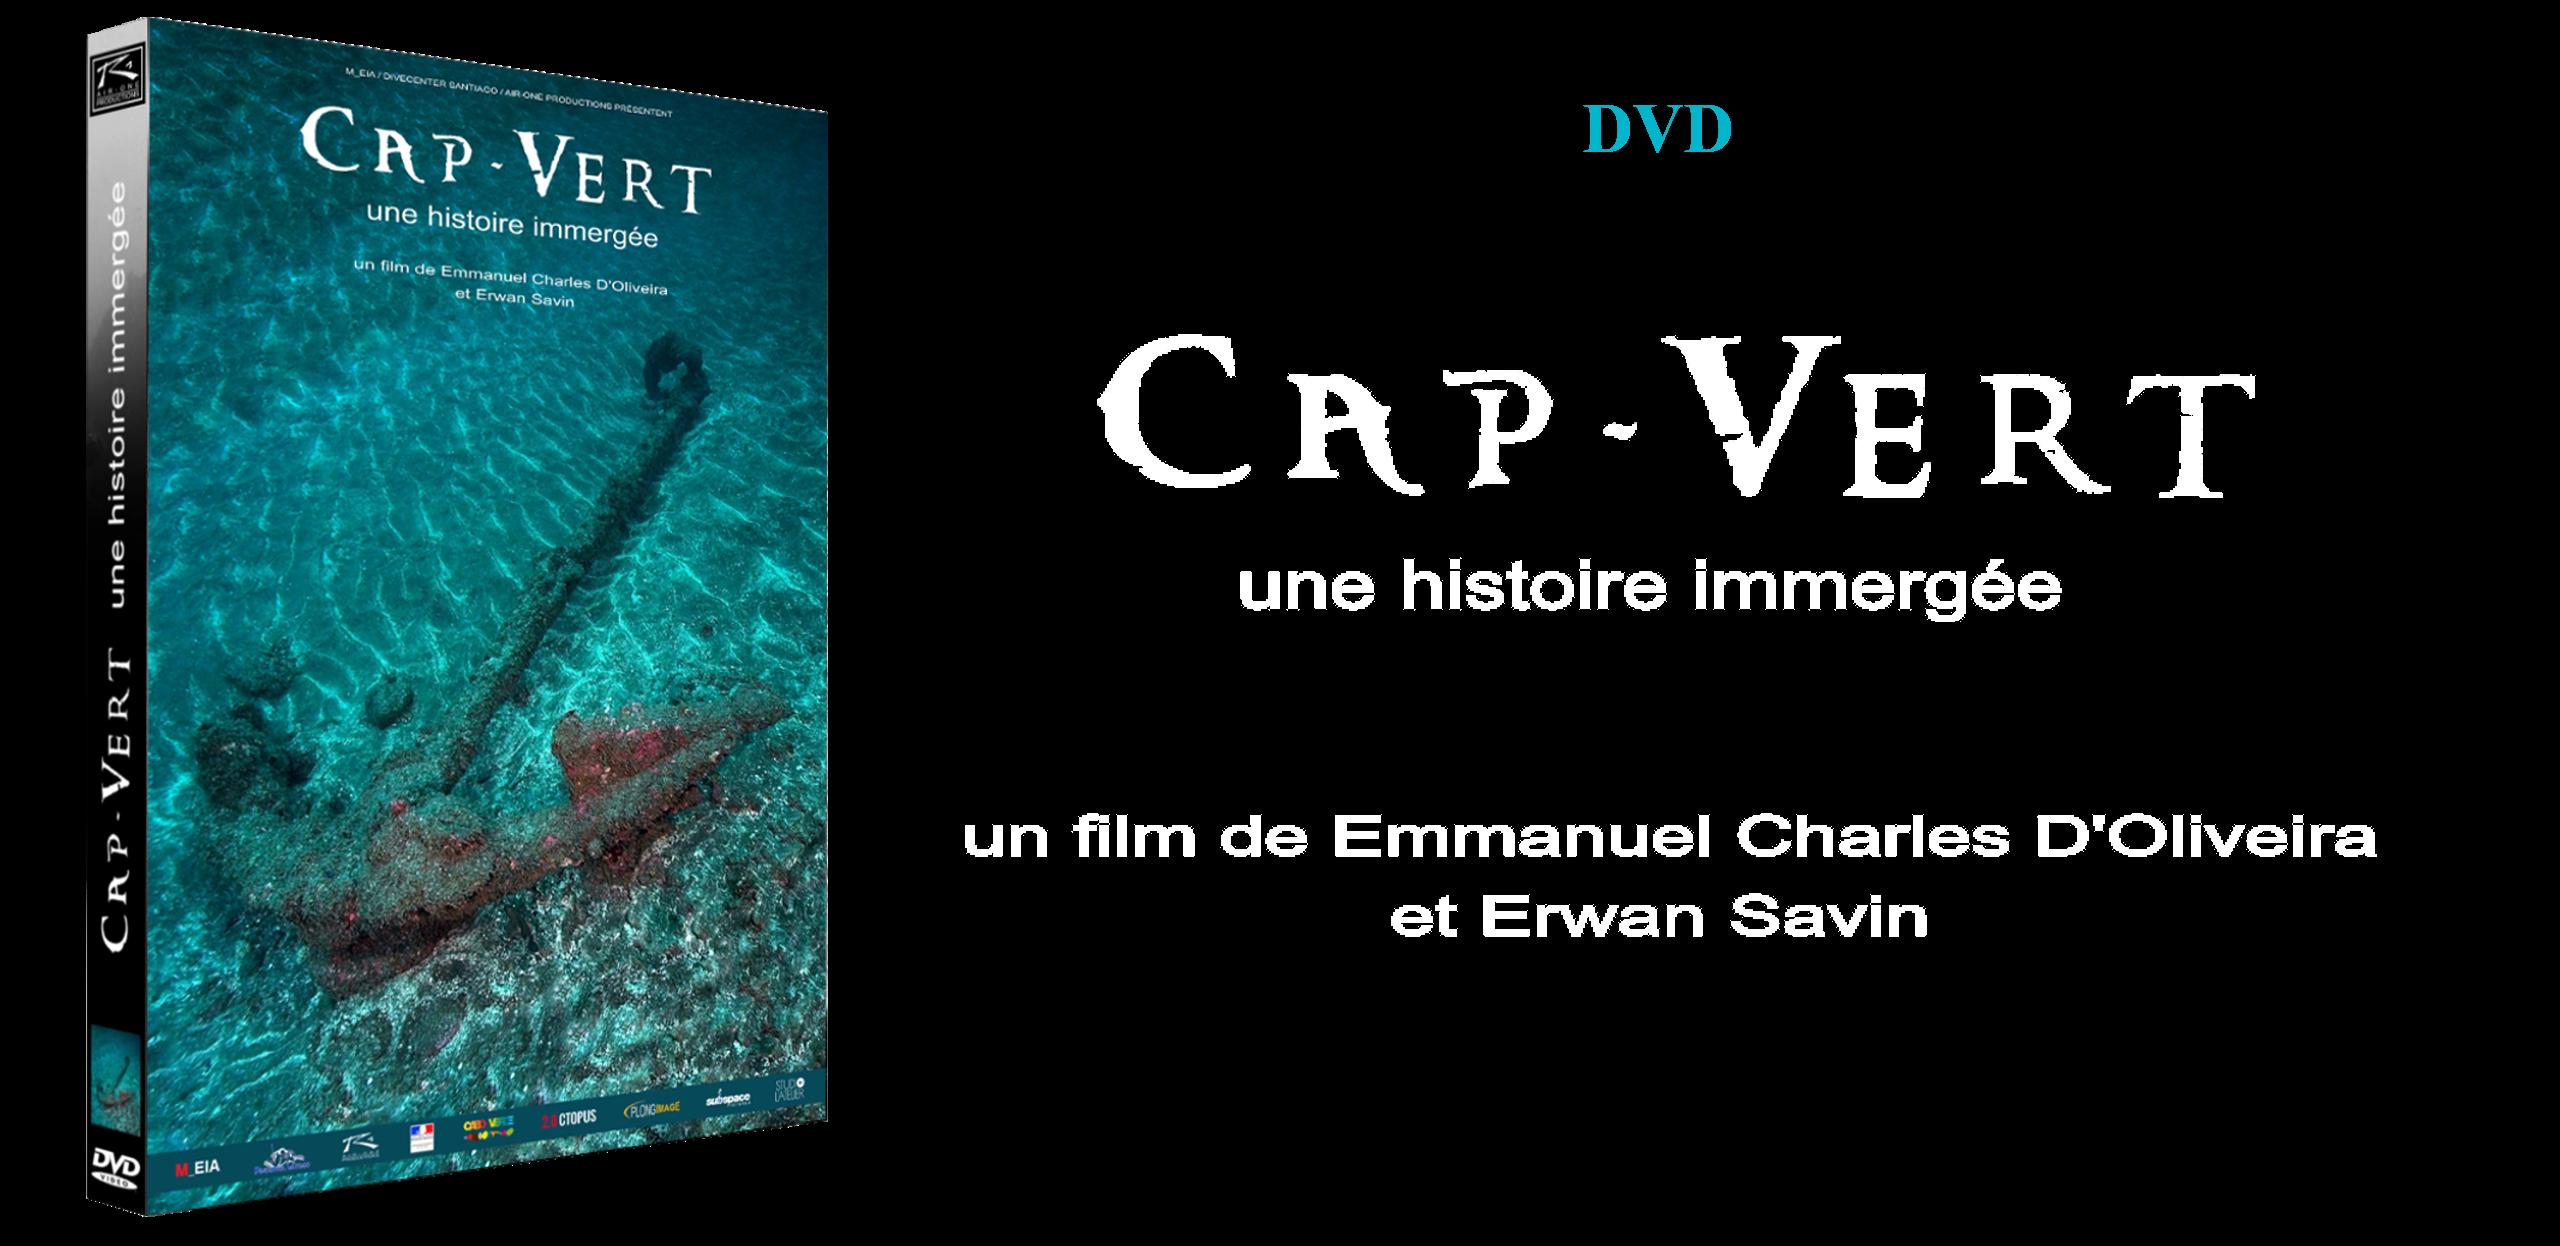 01 VENTE DVD CAP VERT - BANDEAU V2